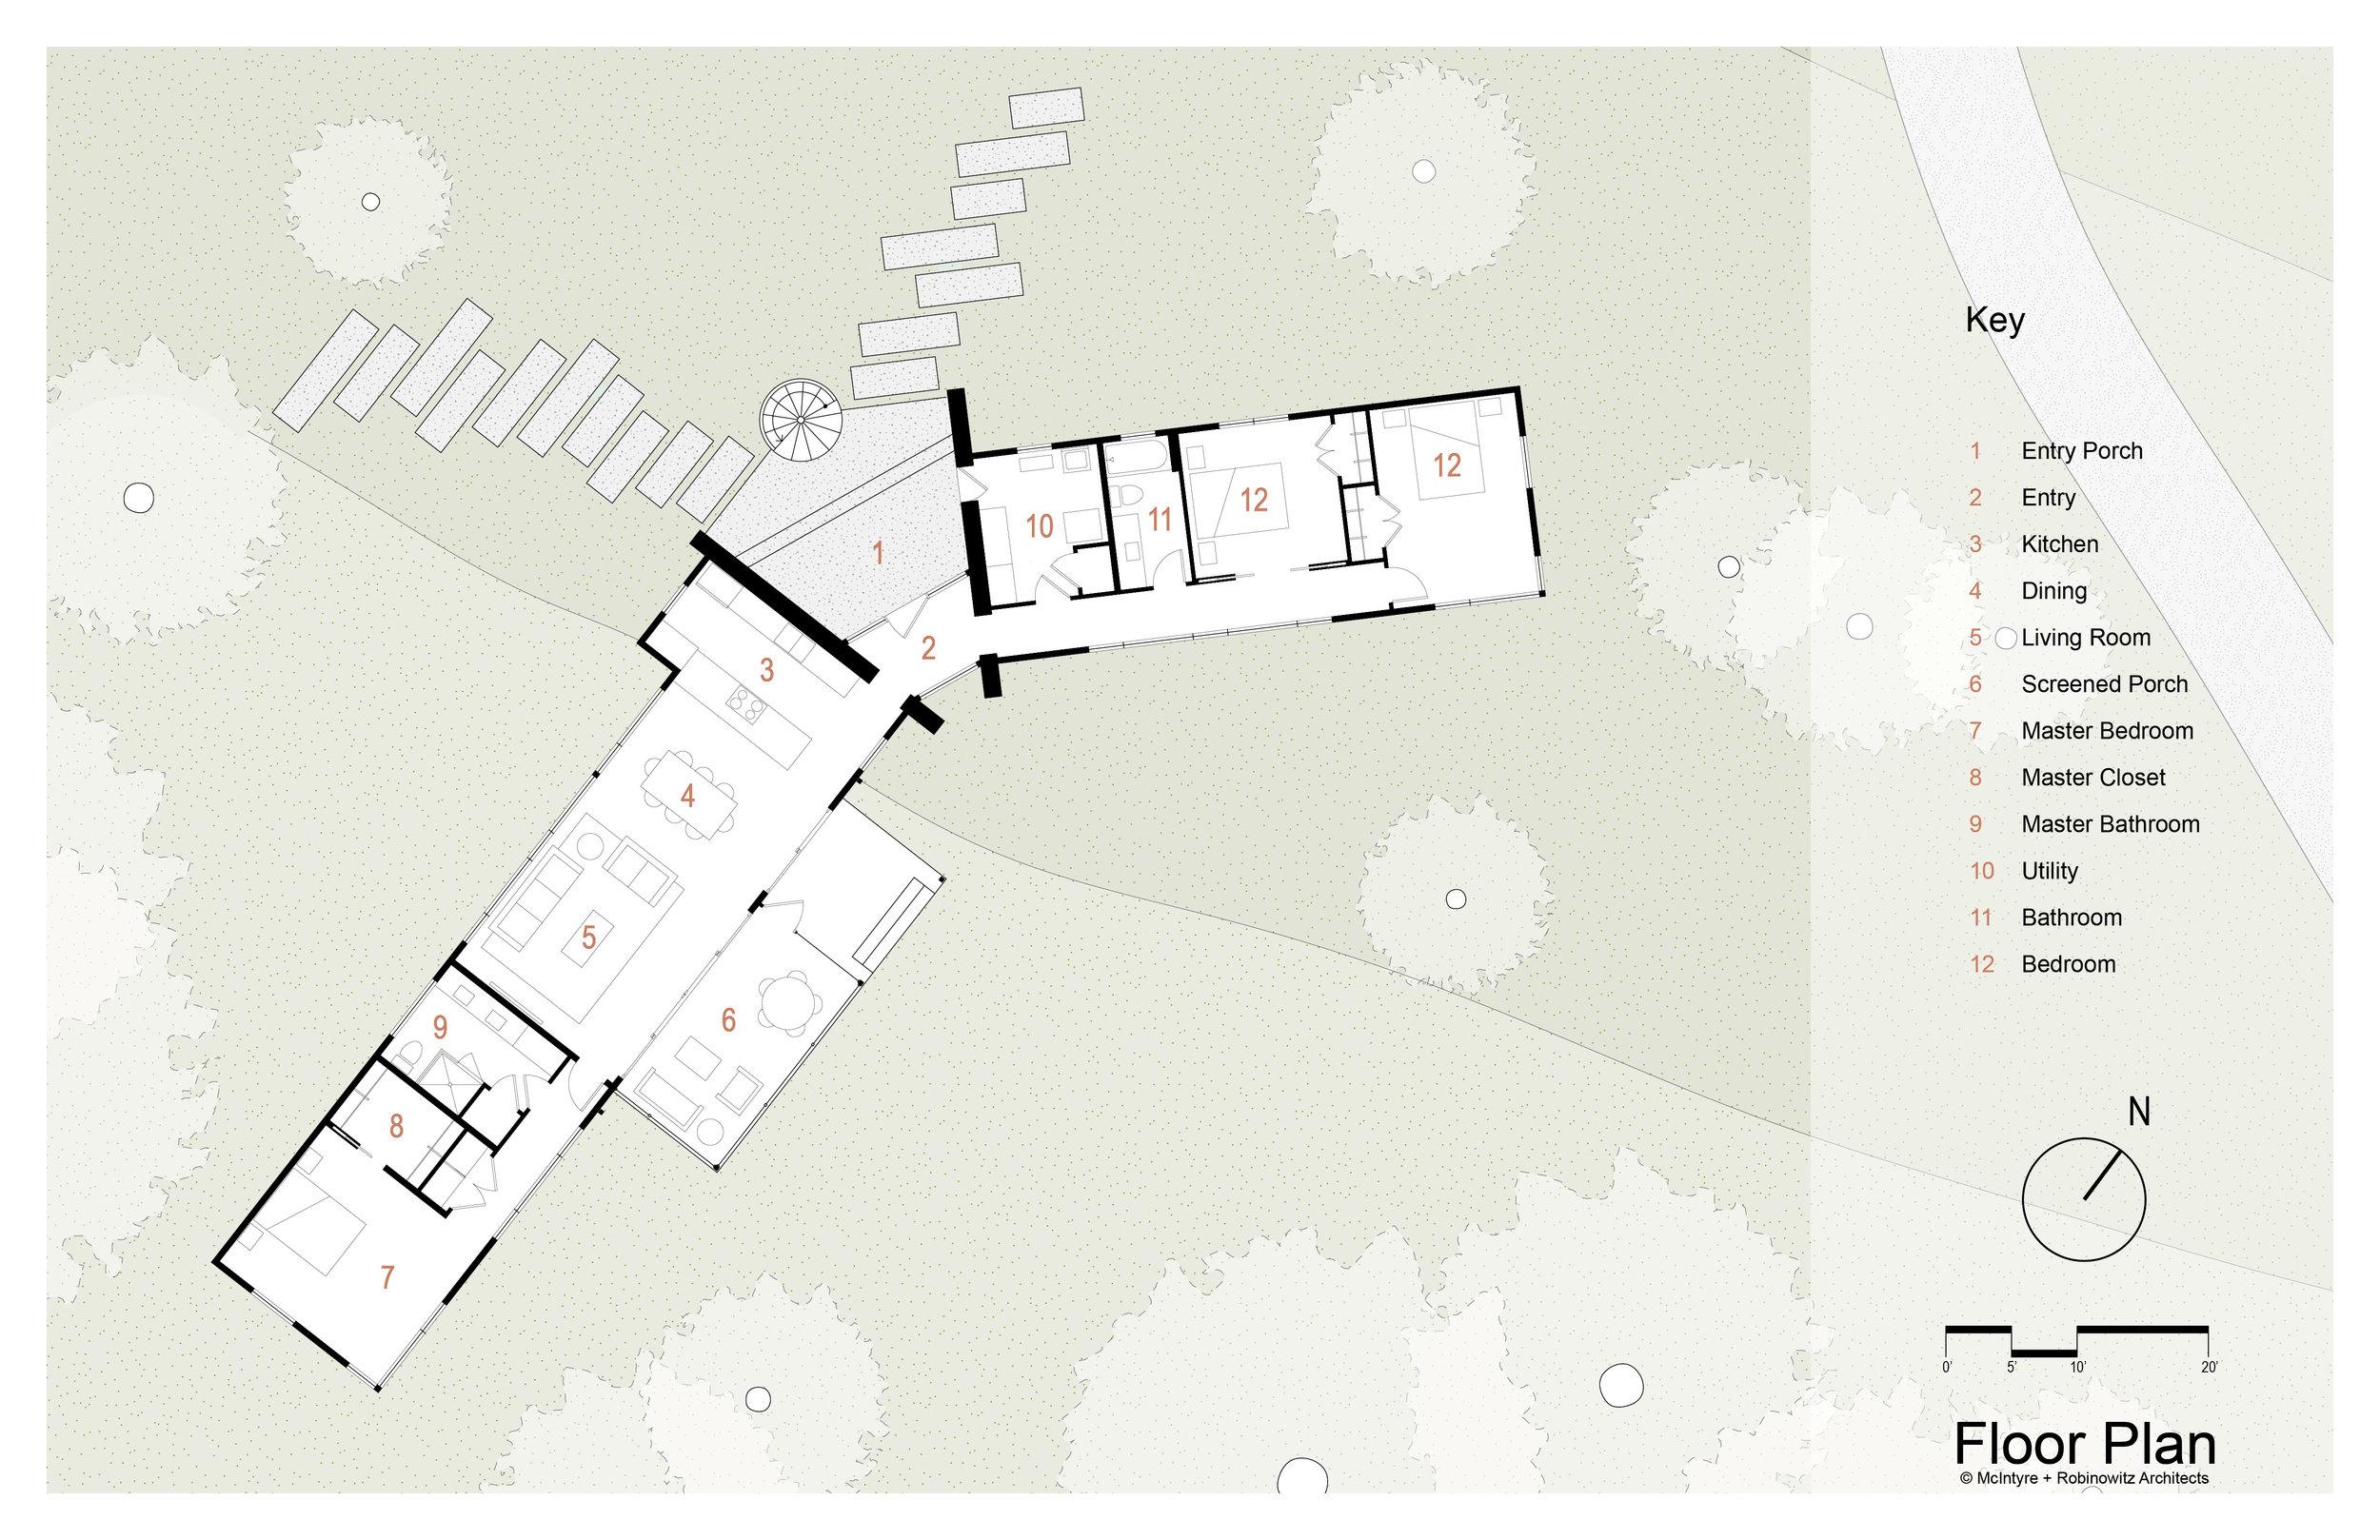 Dogwood floor plan 1.jpg